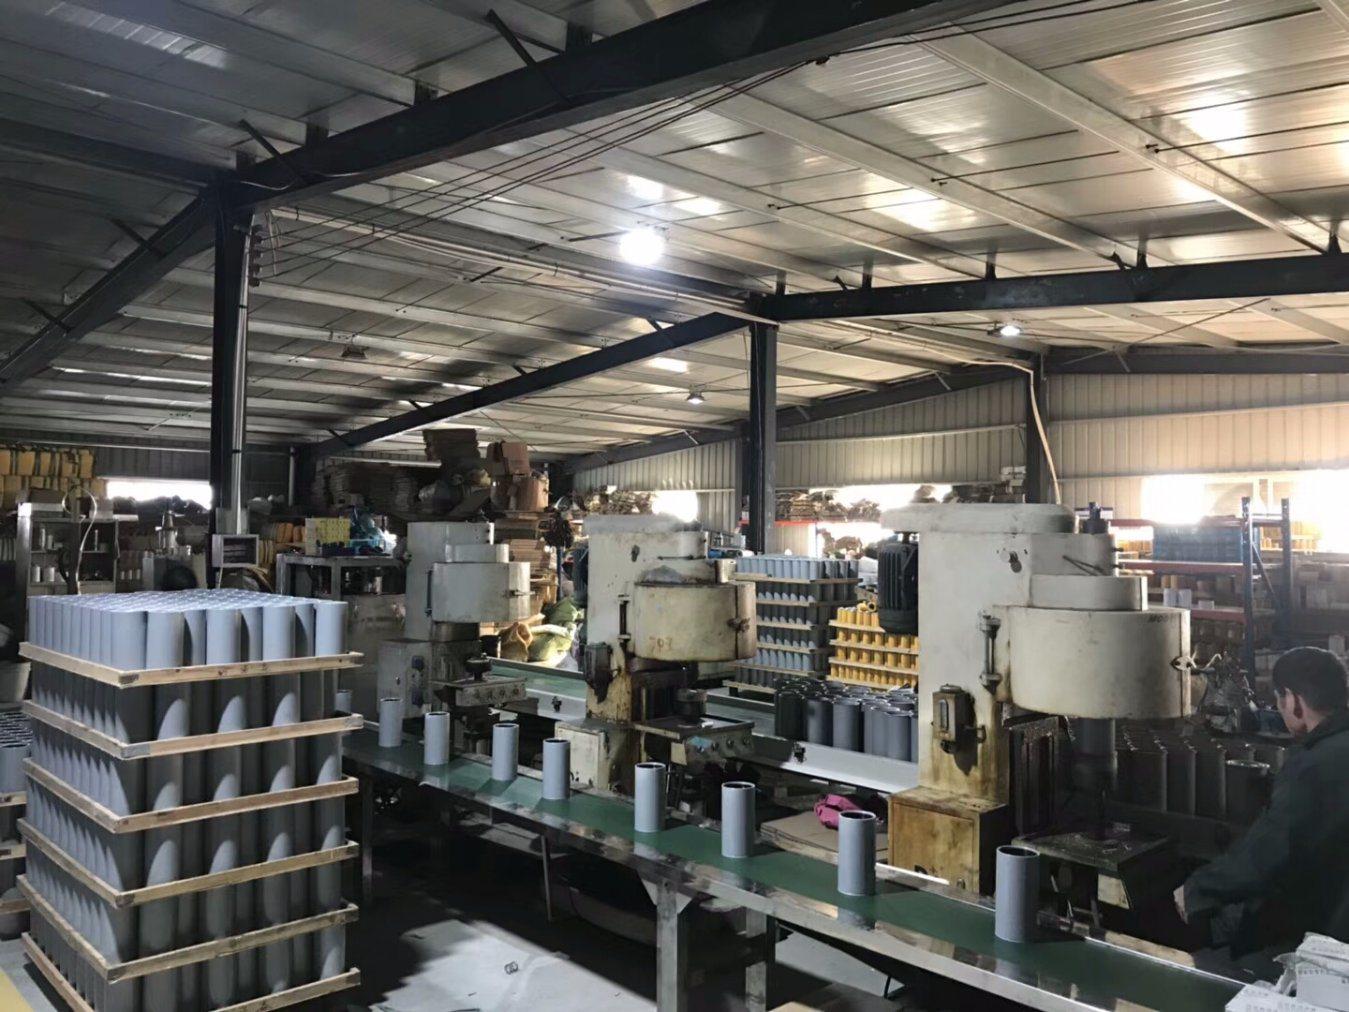 China John Deere Oil Filter Factory Car Fuel For Hyundai Filters Mtu396 Engine